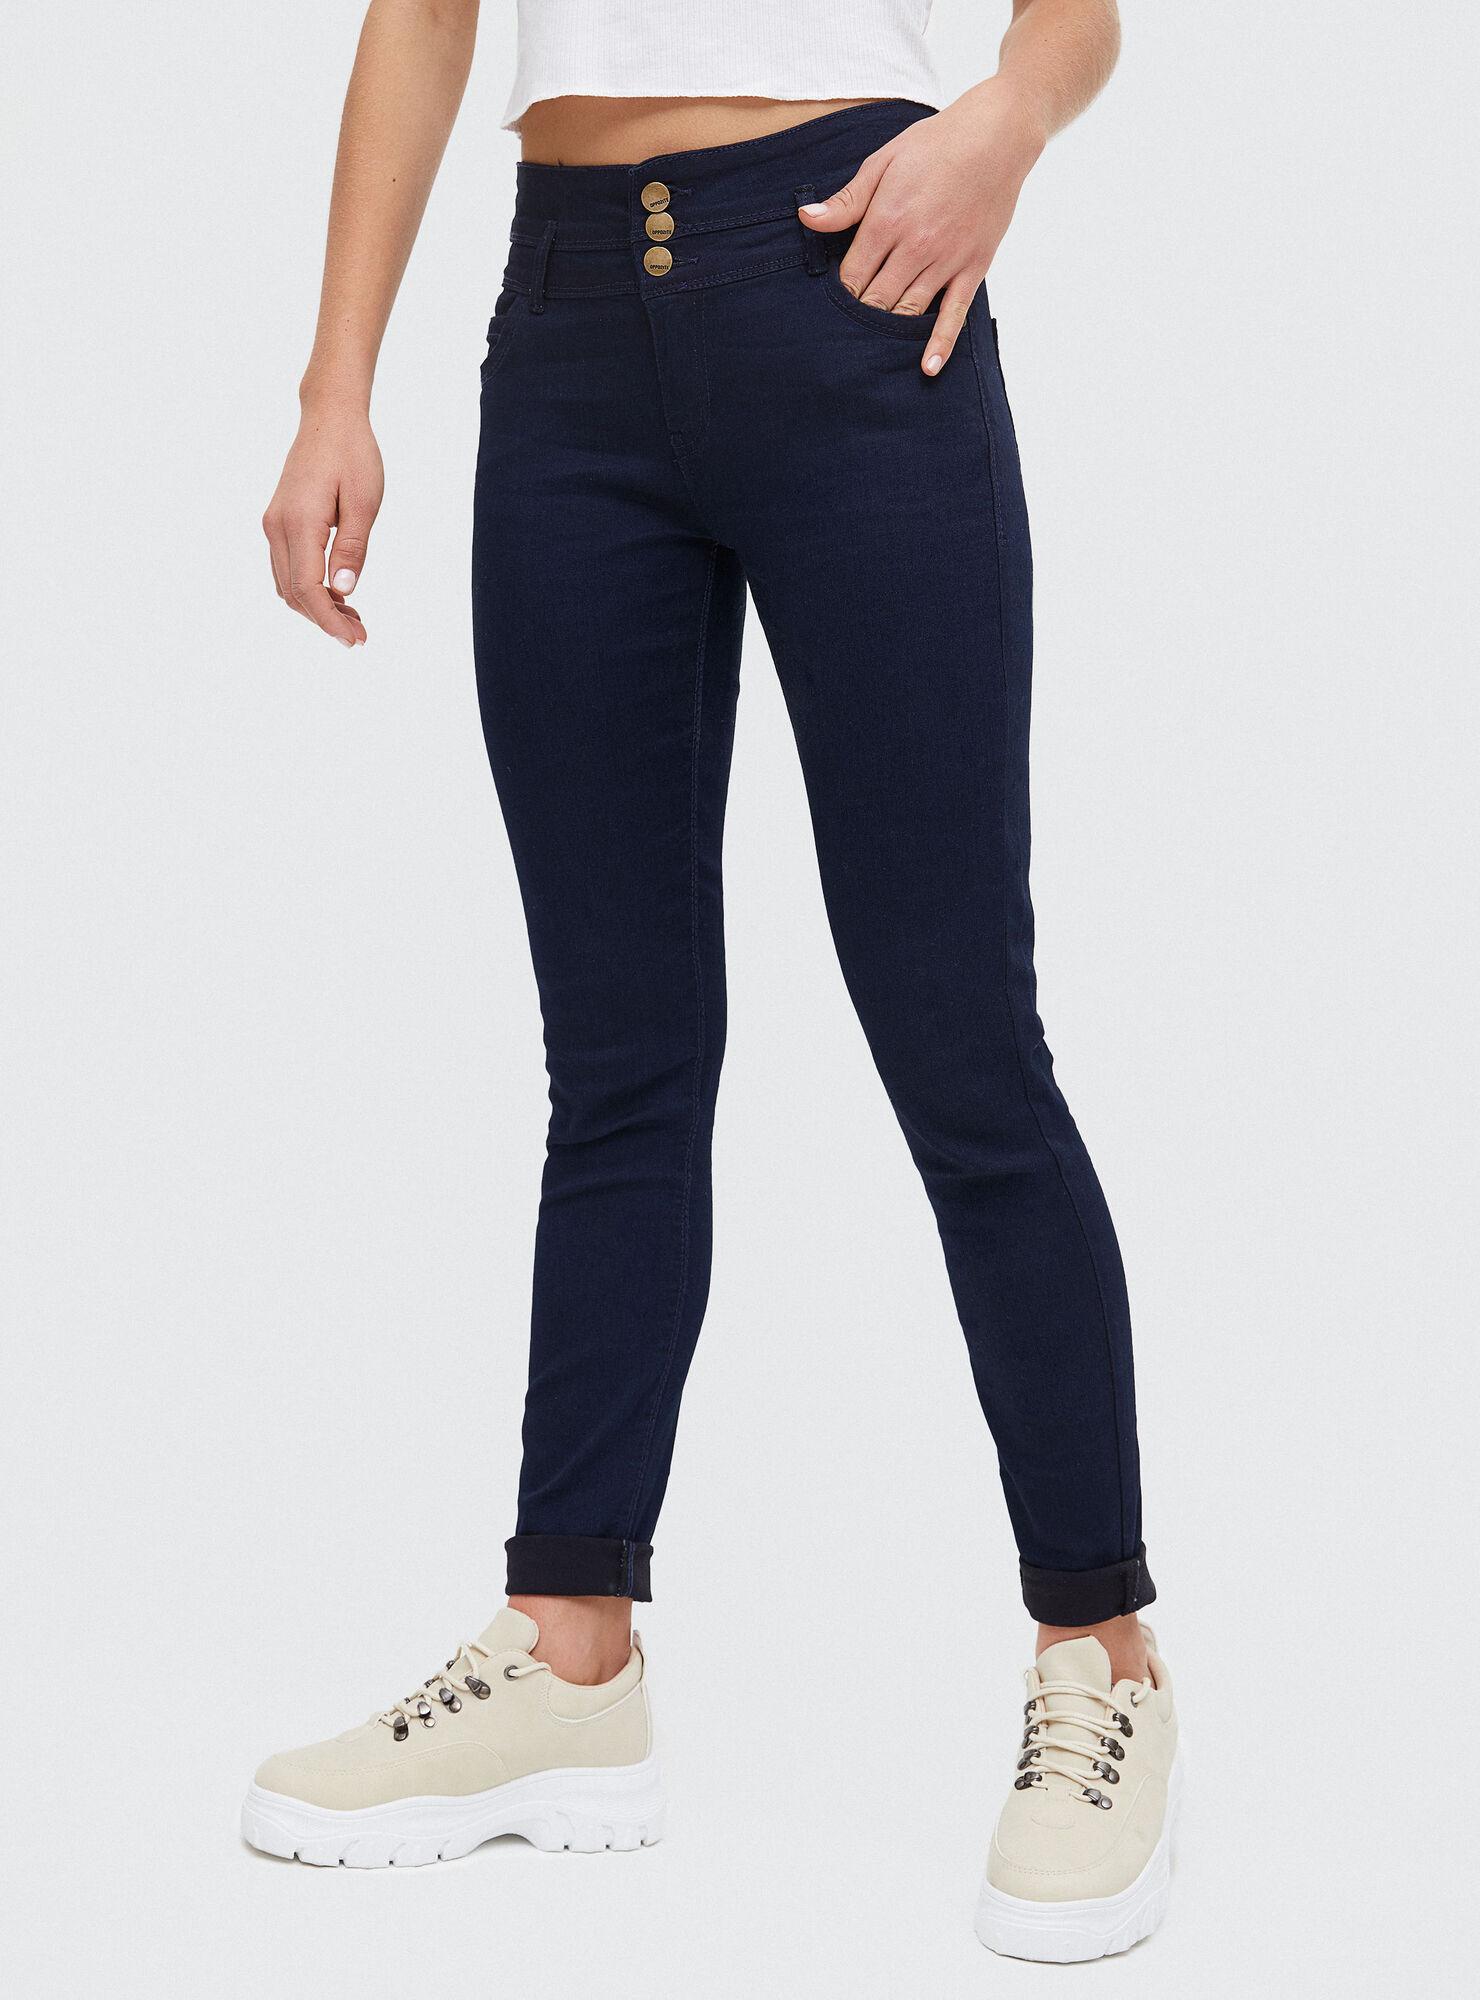 reputable site 172d2 811b9 Jeans 3 Botones Push Up Opposite